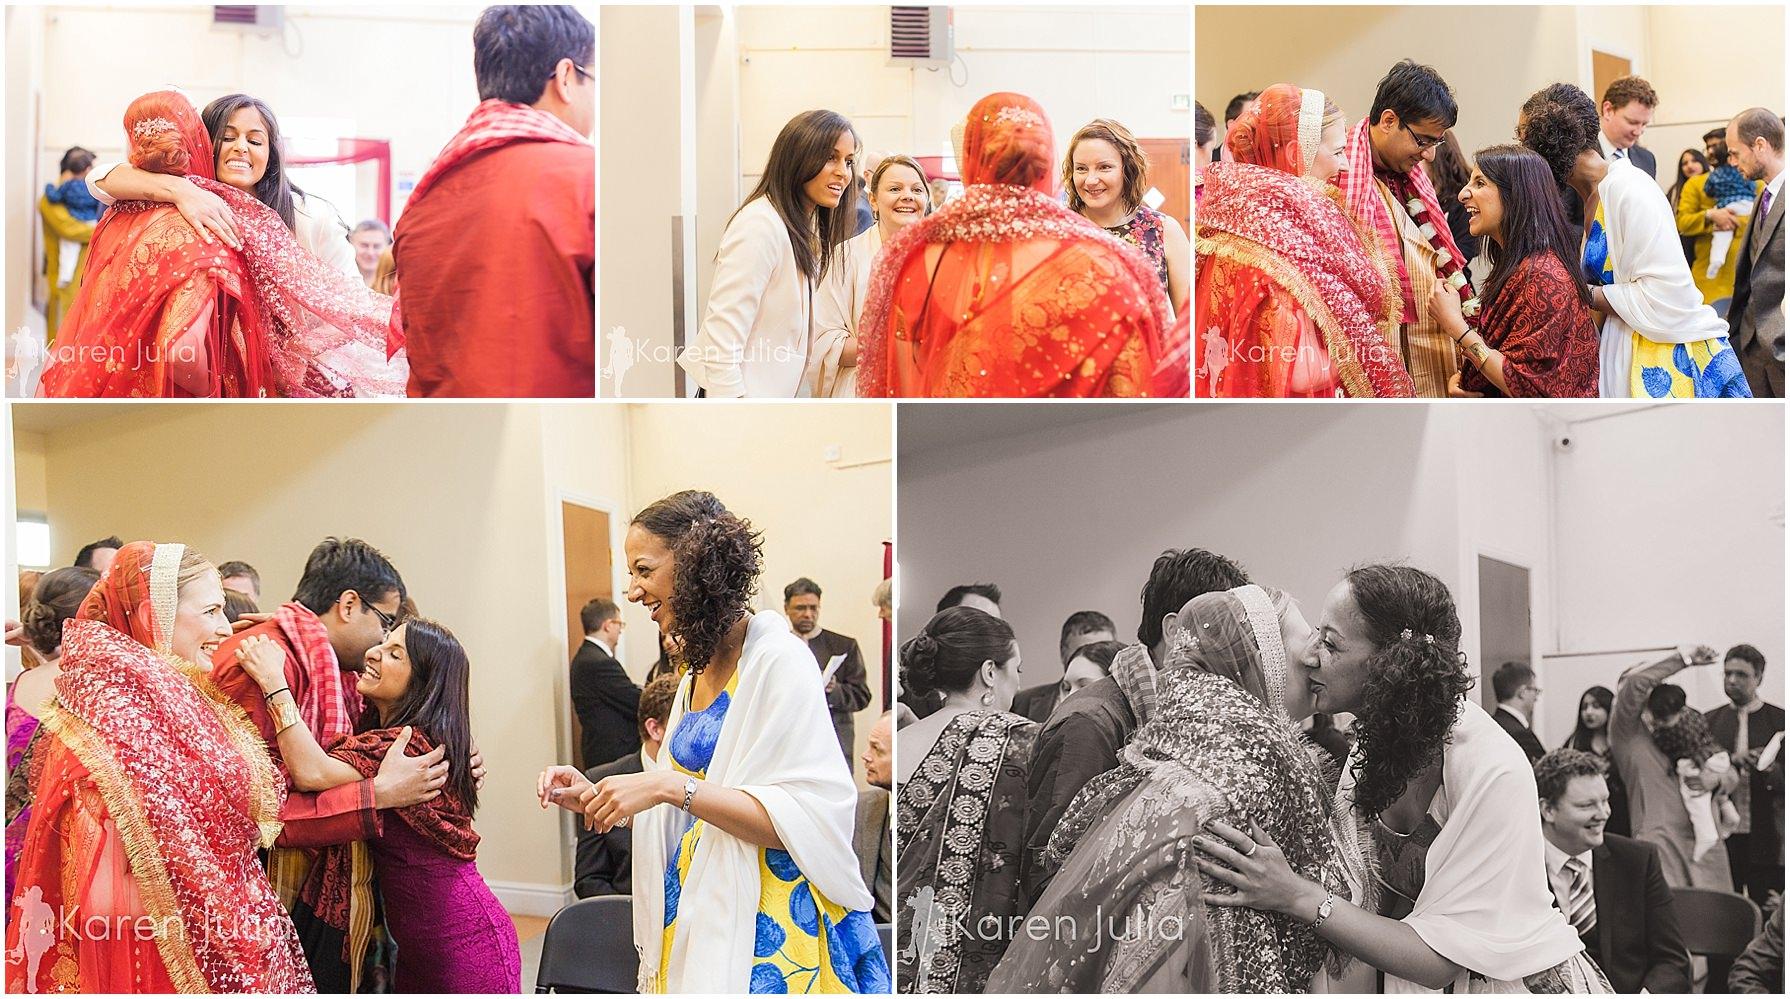 Gita-Bhavan-Hindu-Temple-Wedding-Photography-11